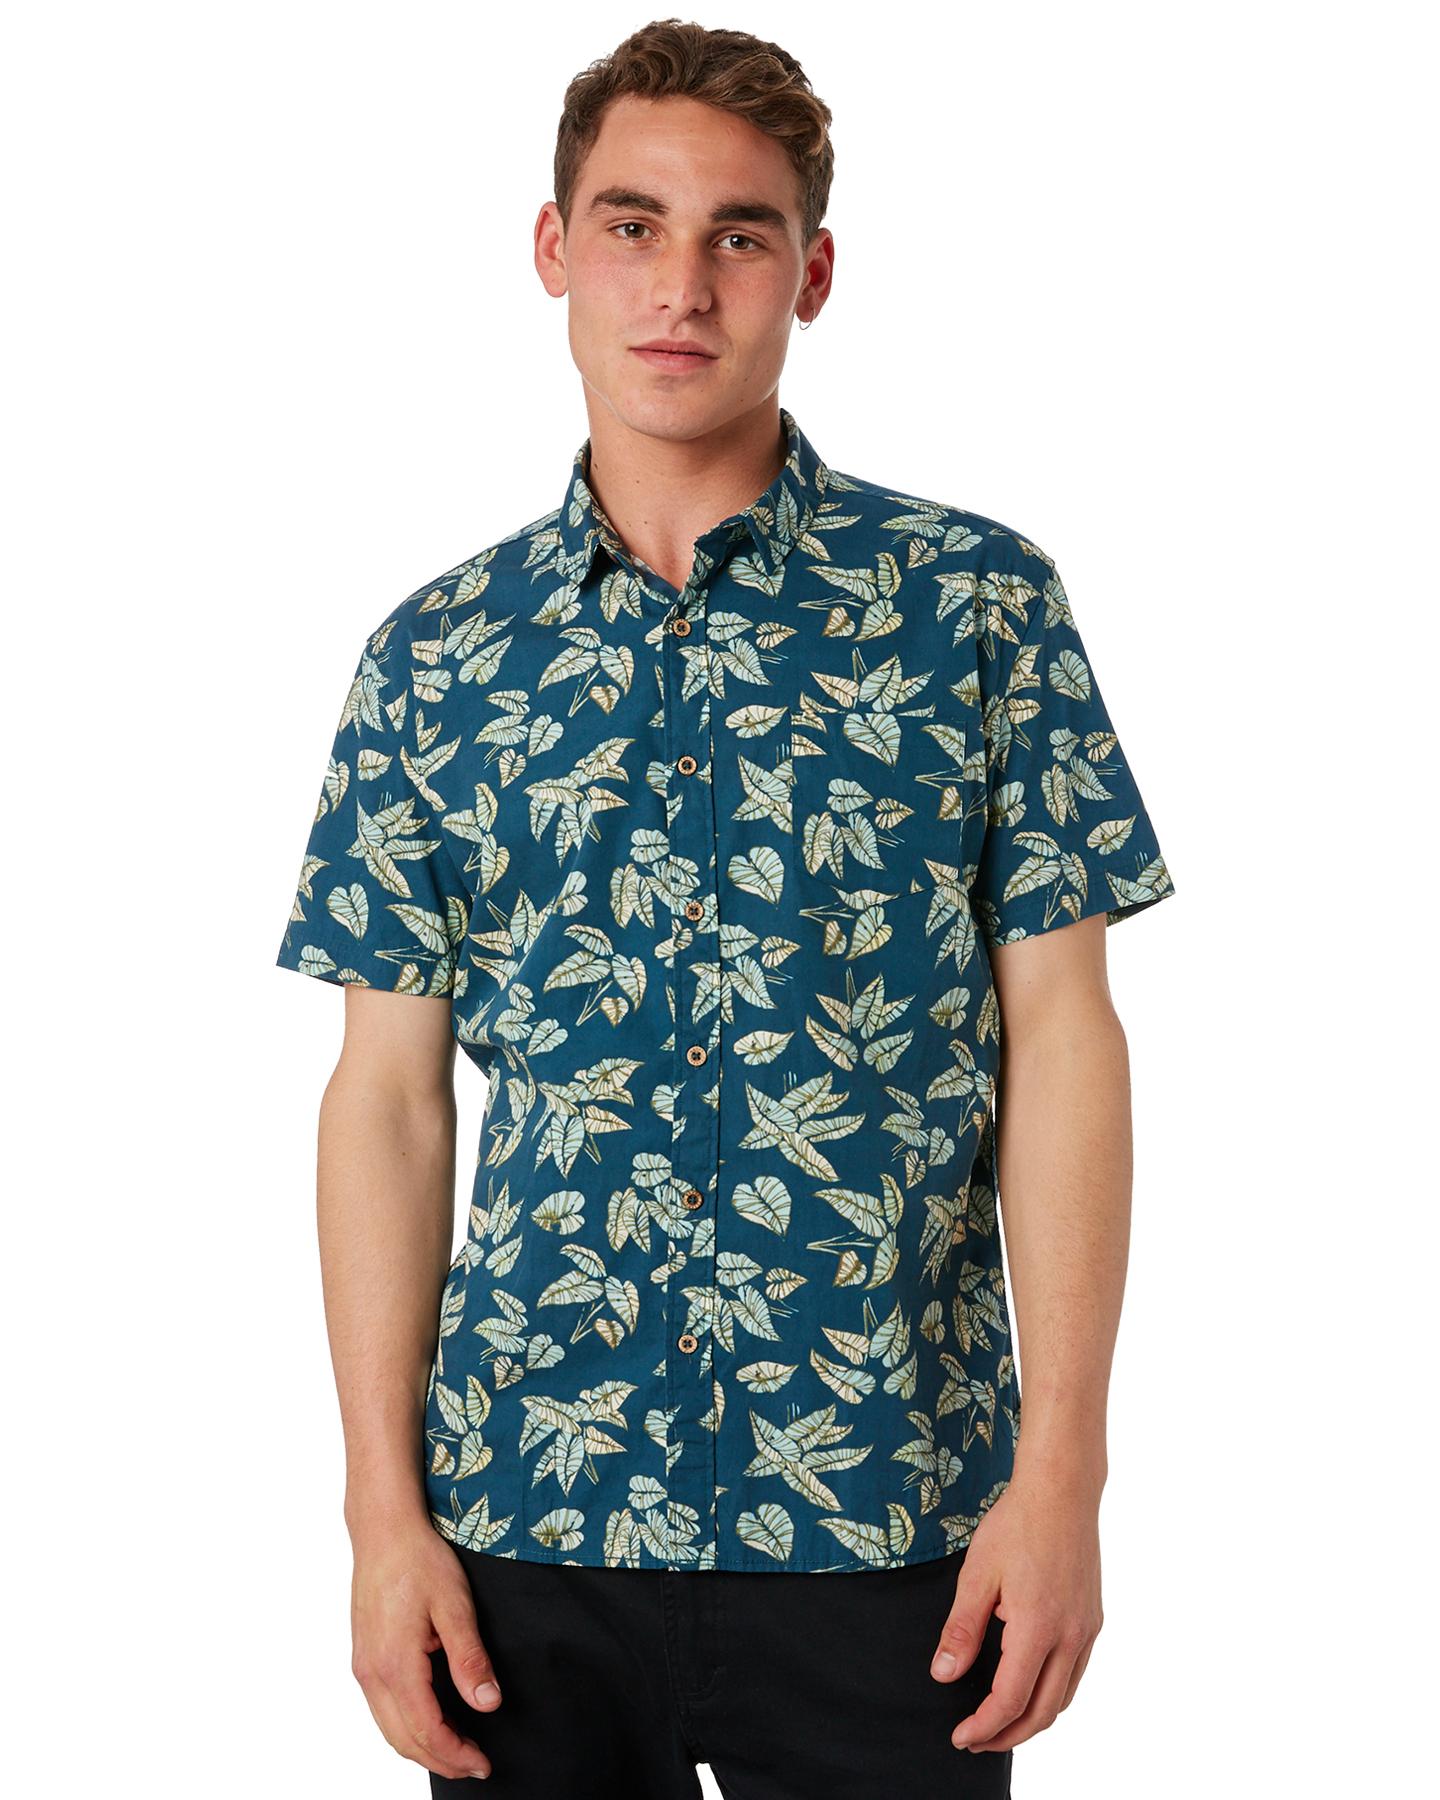 908d1b88bbf Banks Men s Rosewood Mens Ss Shirt Short Sleeve Cotton Black